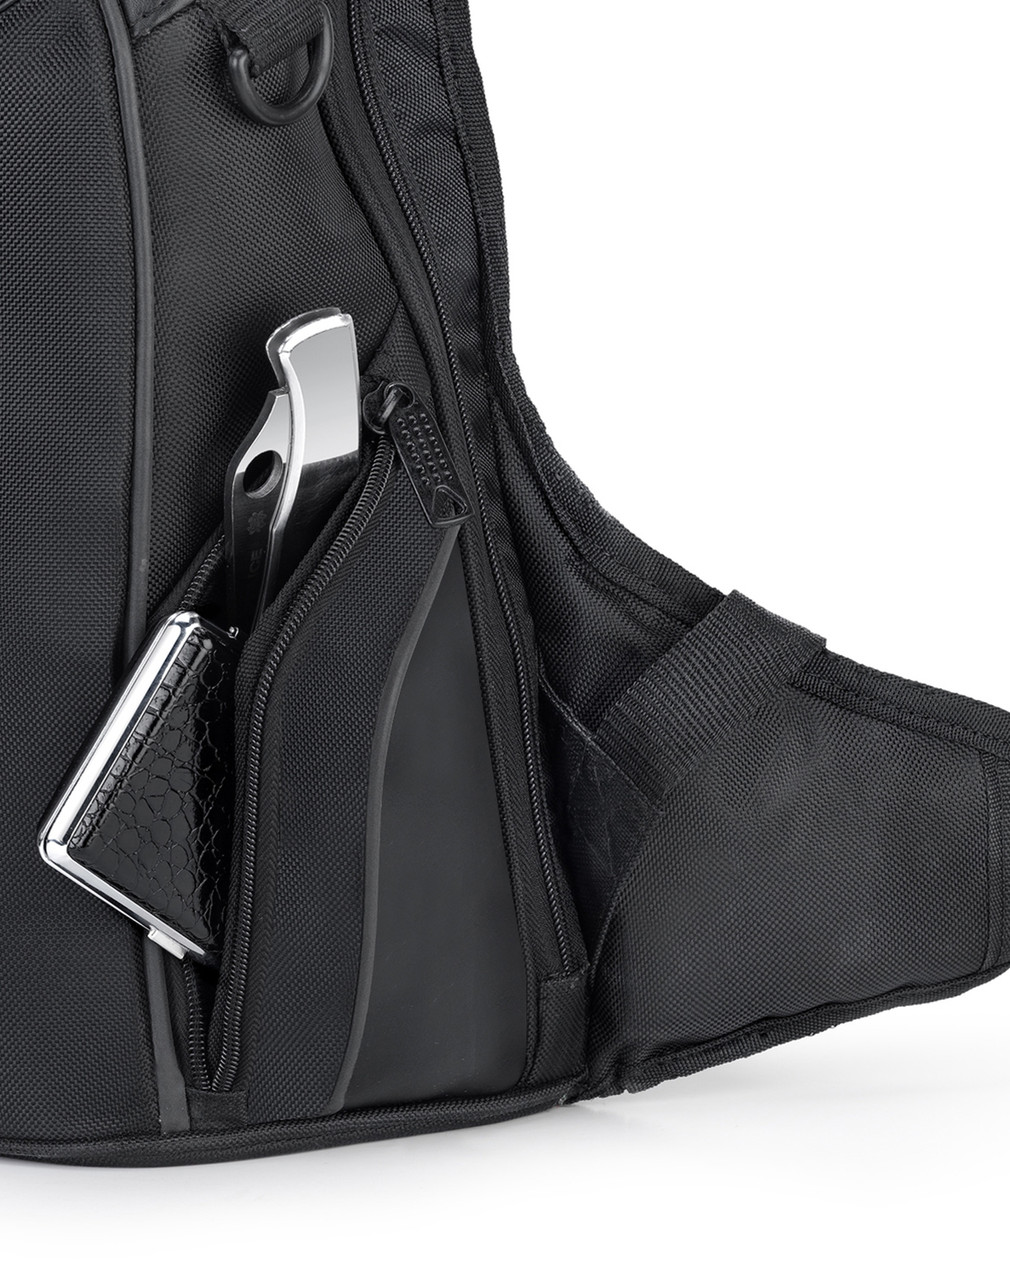 Viking Medium Black Street/Sportbike Backpack Front Pocket